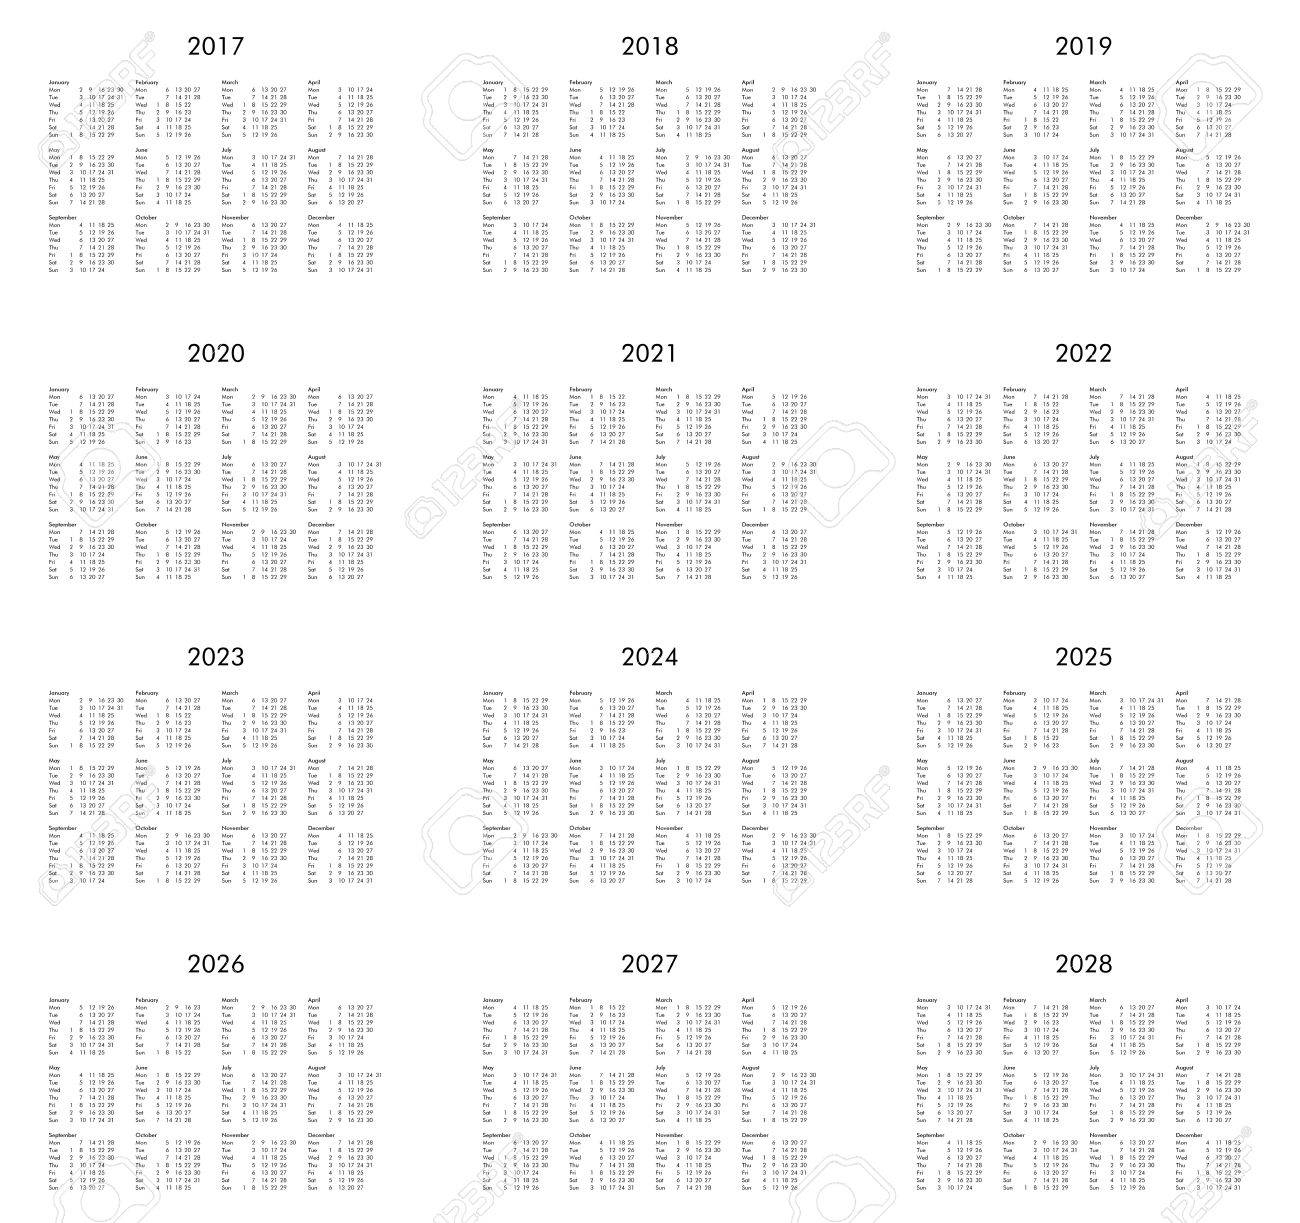 Calendar Of Years 2017, 2018, 2019, 2020, 2021, 2022, 2023, 2024